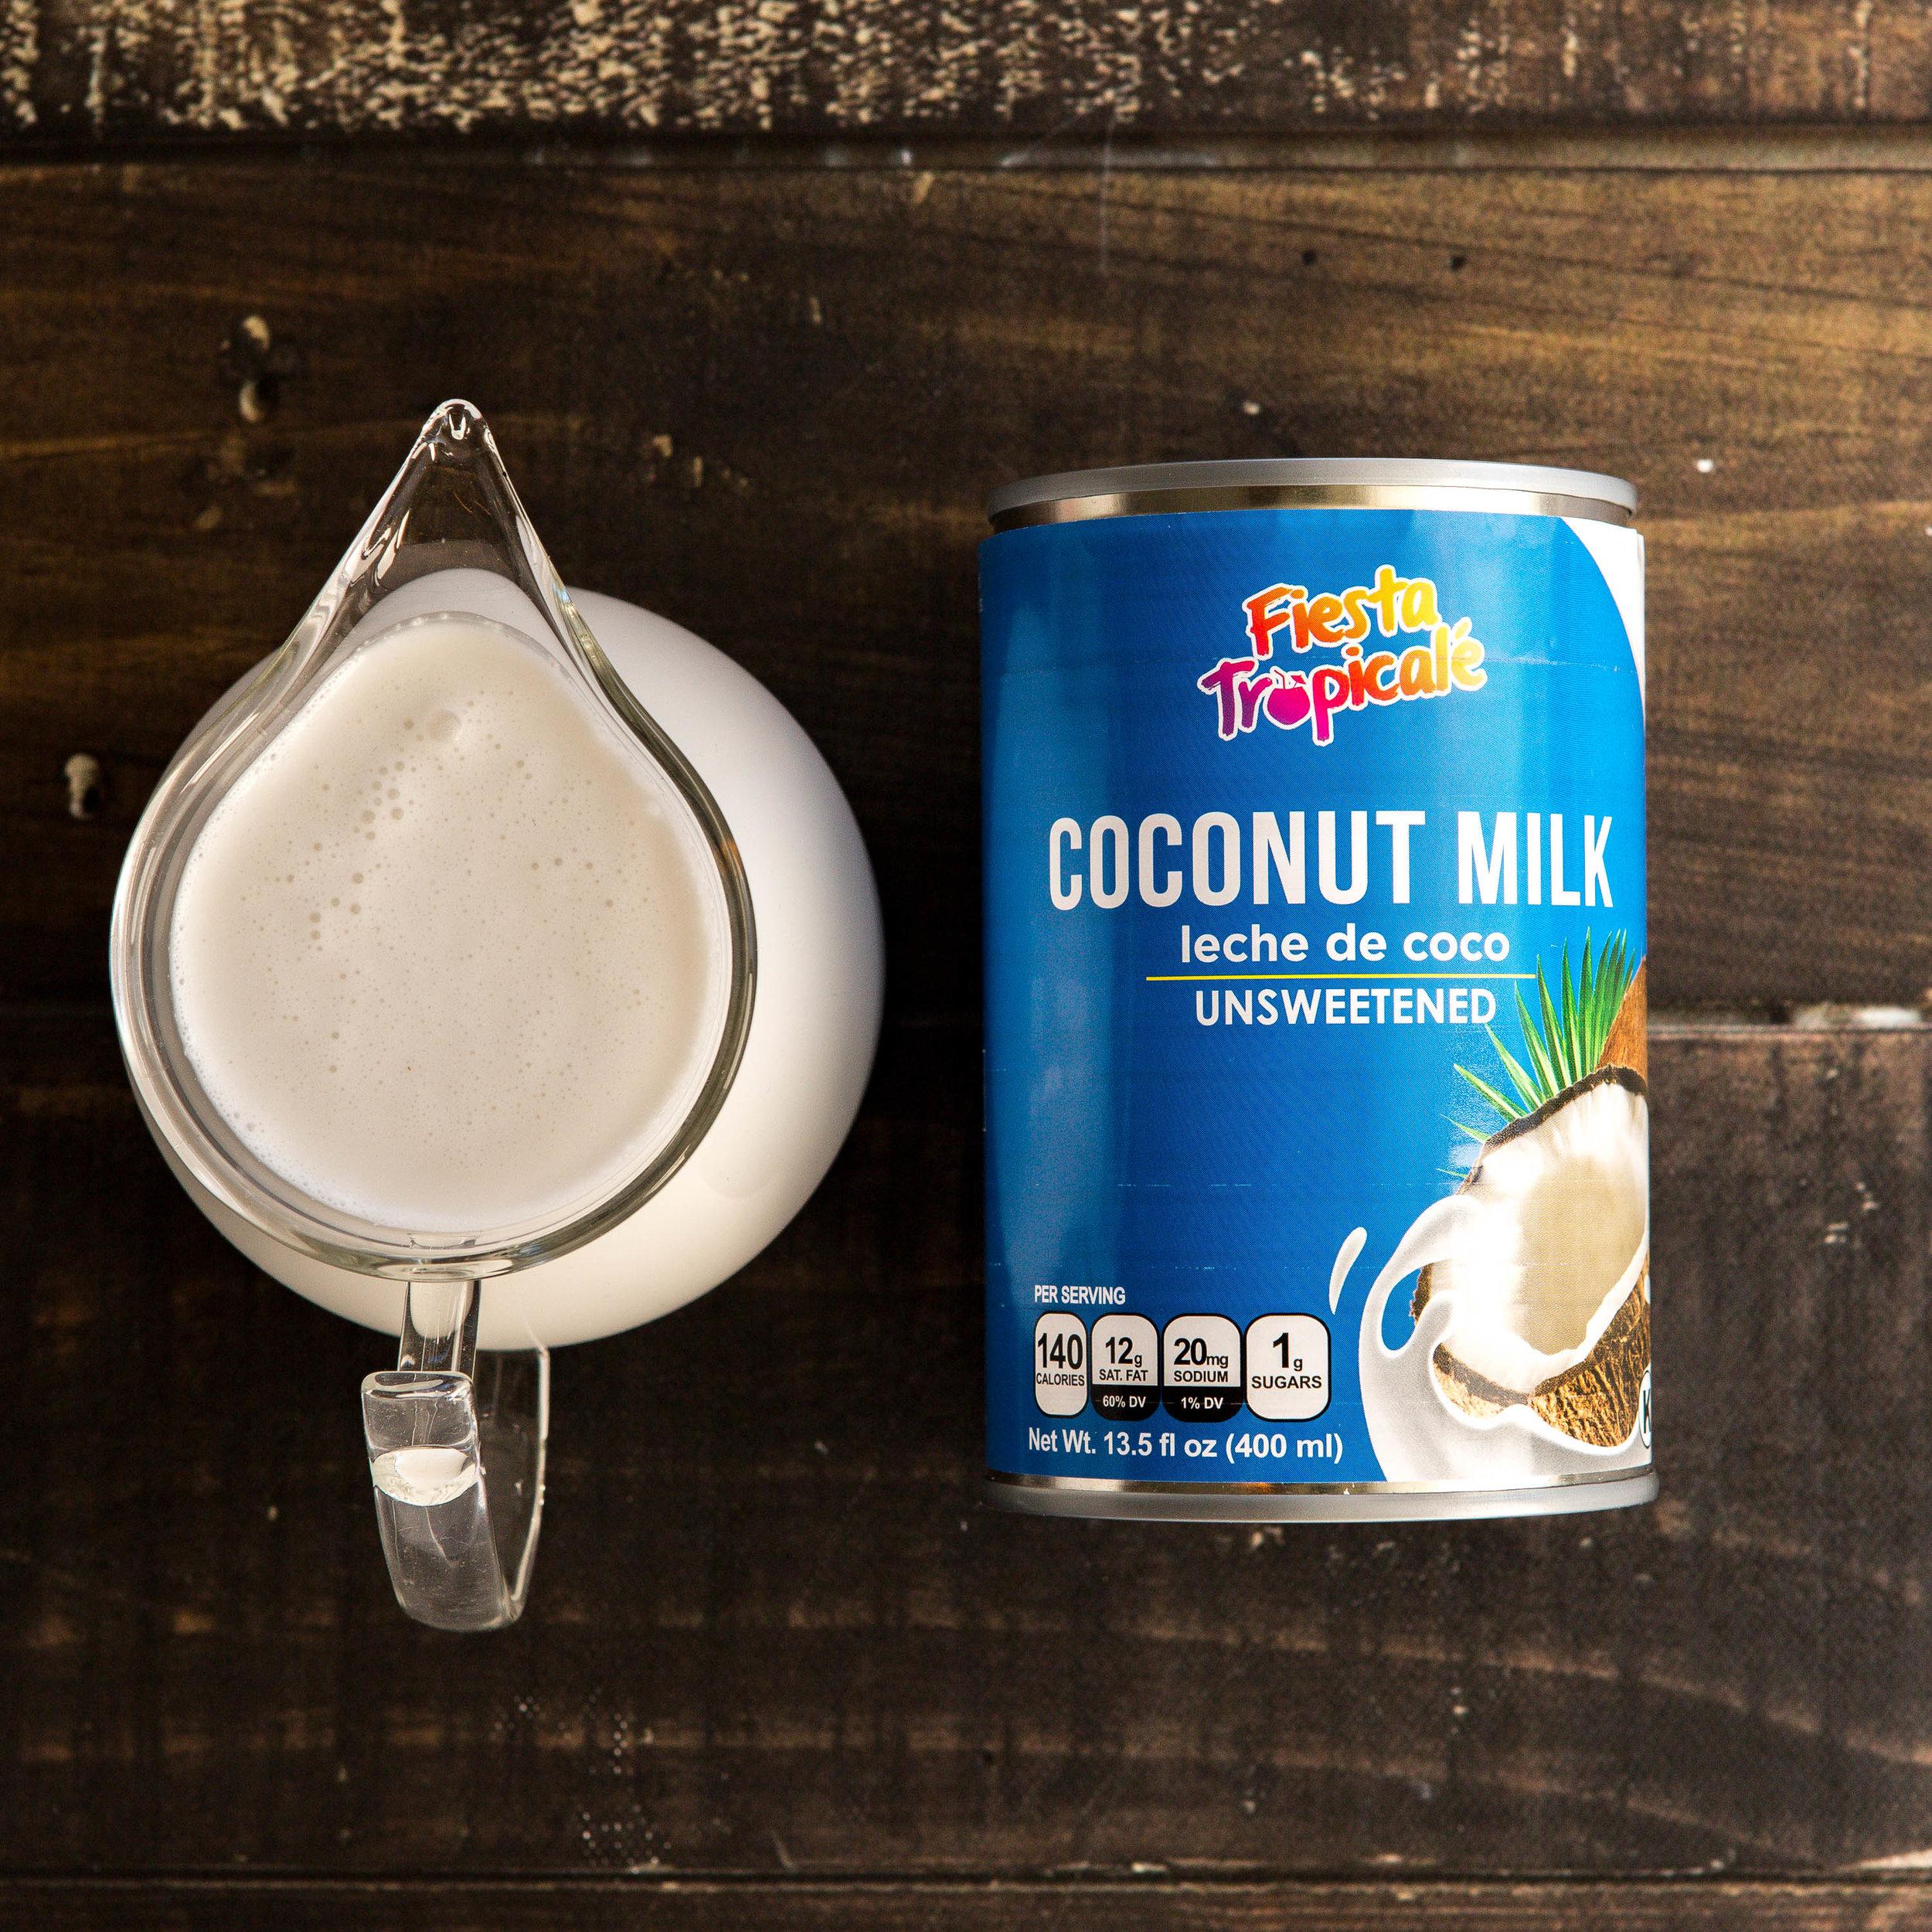 Fiesta Tropicale Natural Coconut Milk